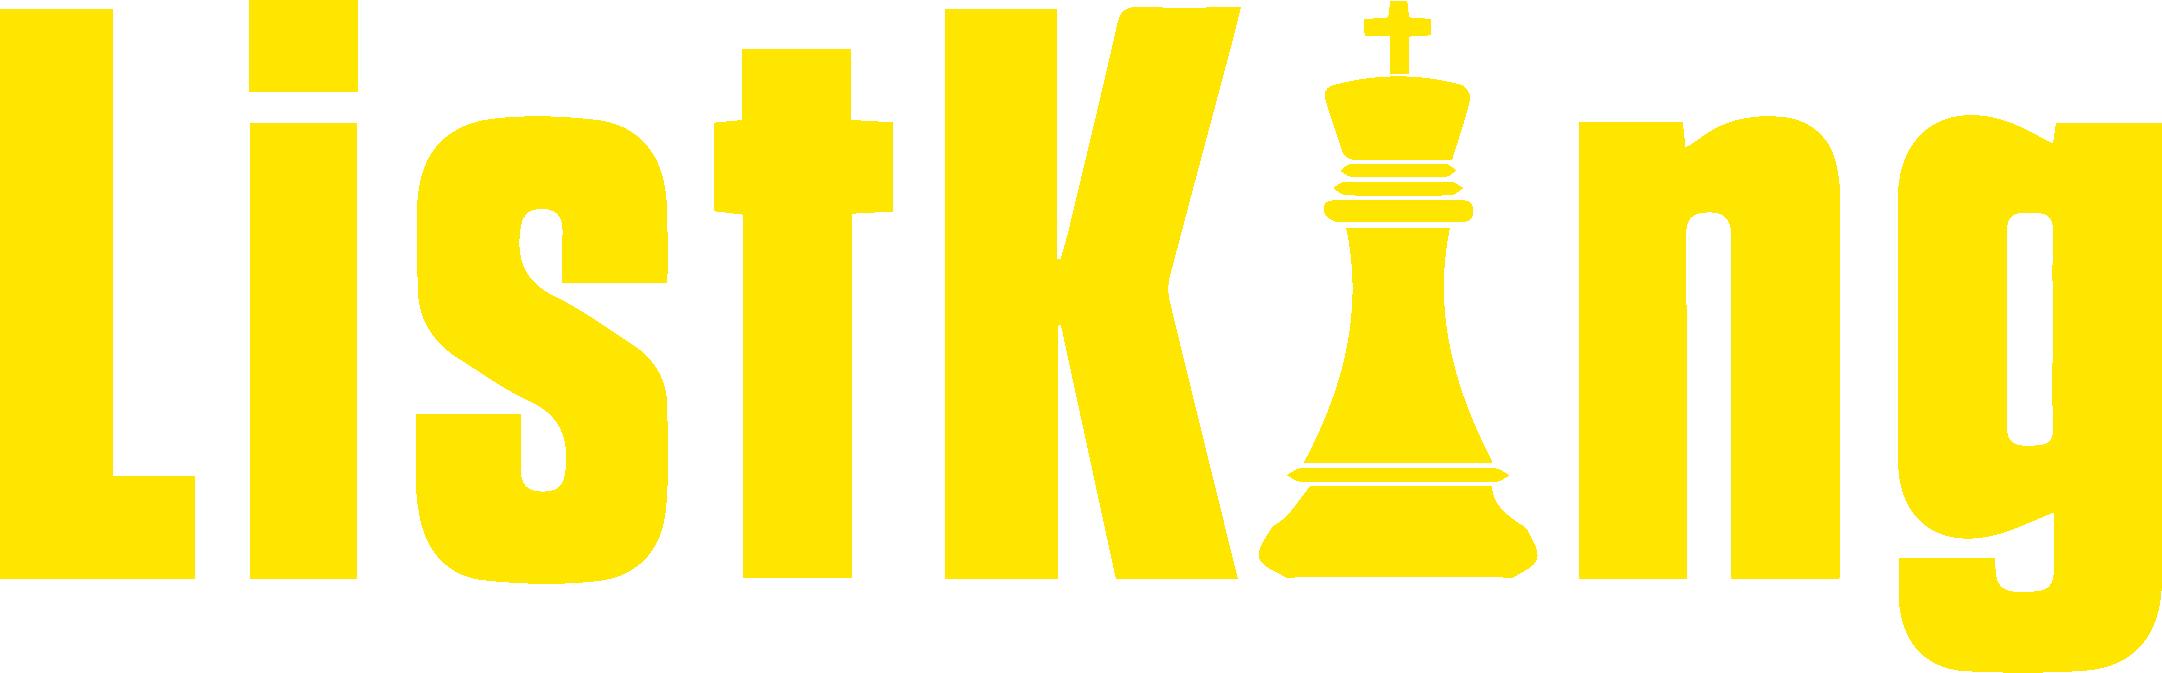 Listking_Logo_geel